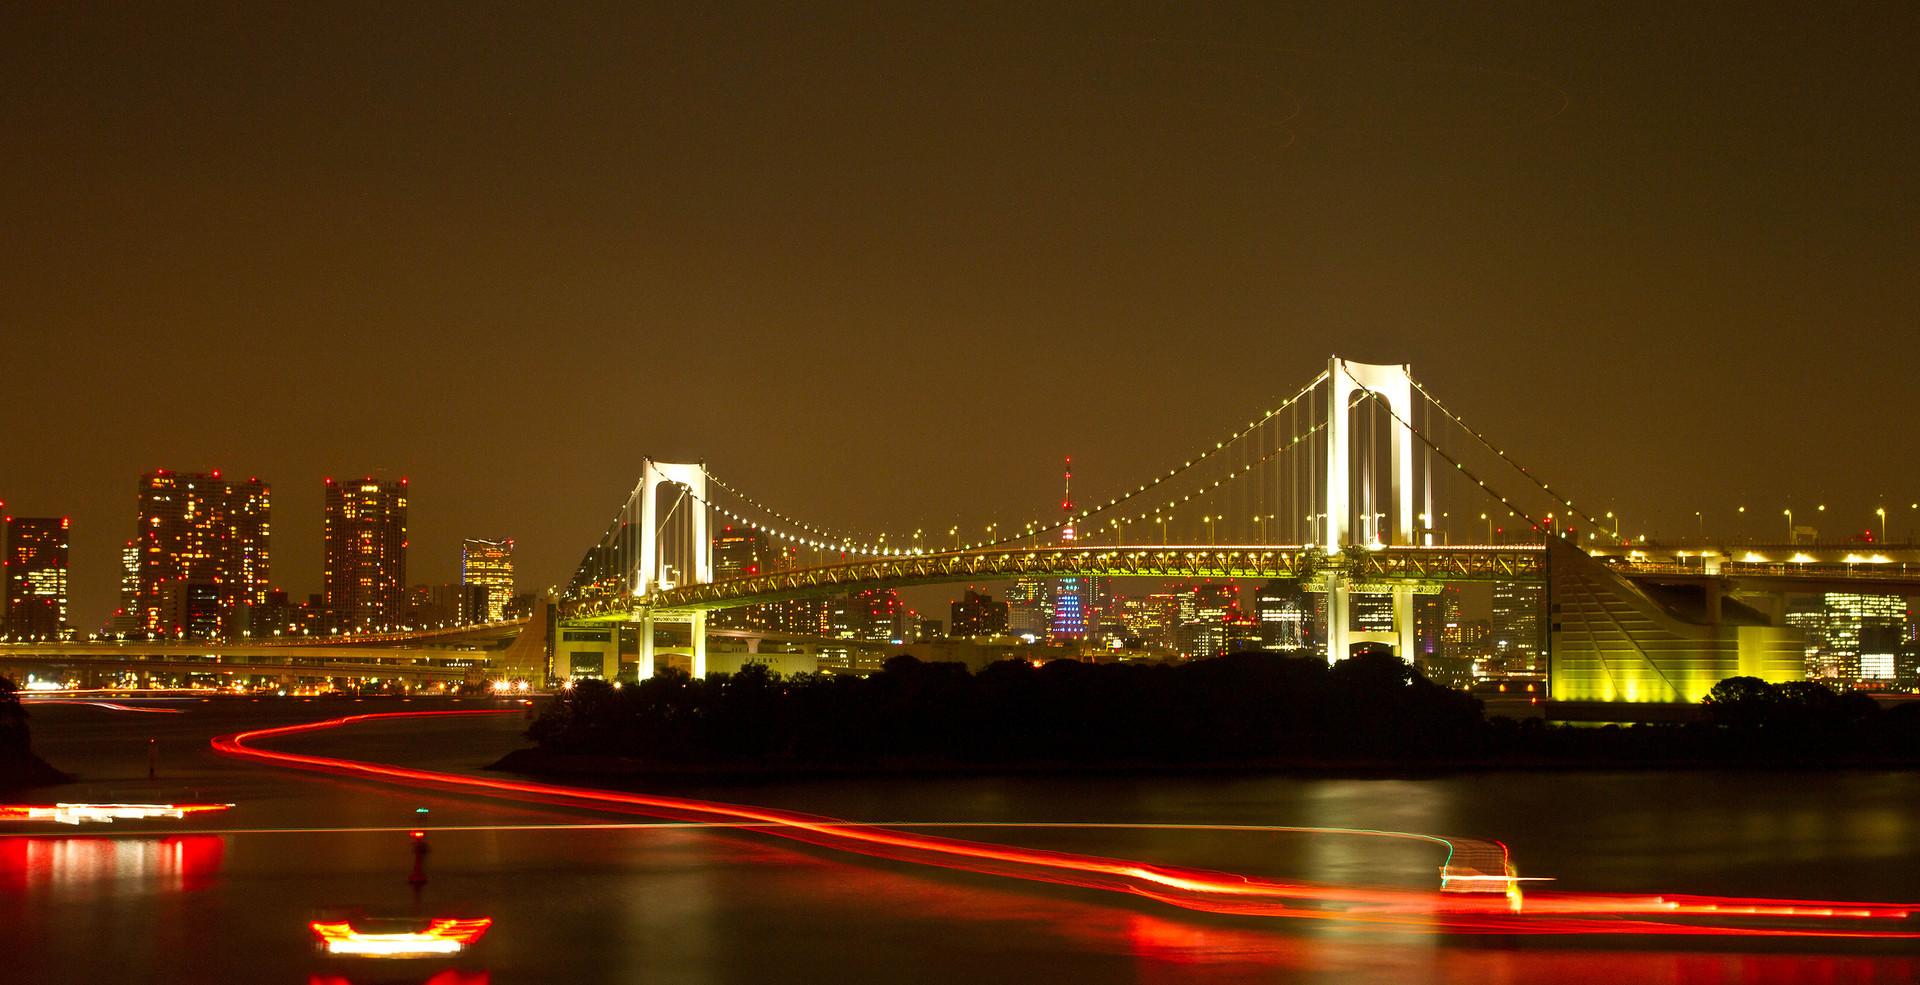 Rainbow bridge in tokyo with long light